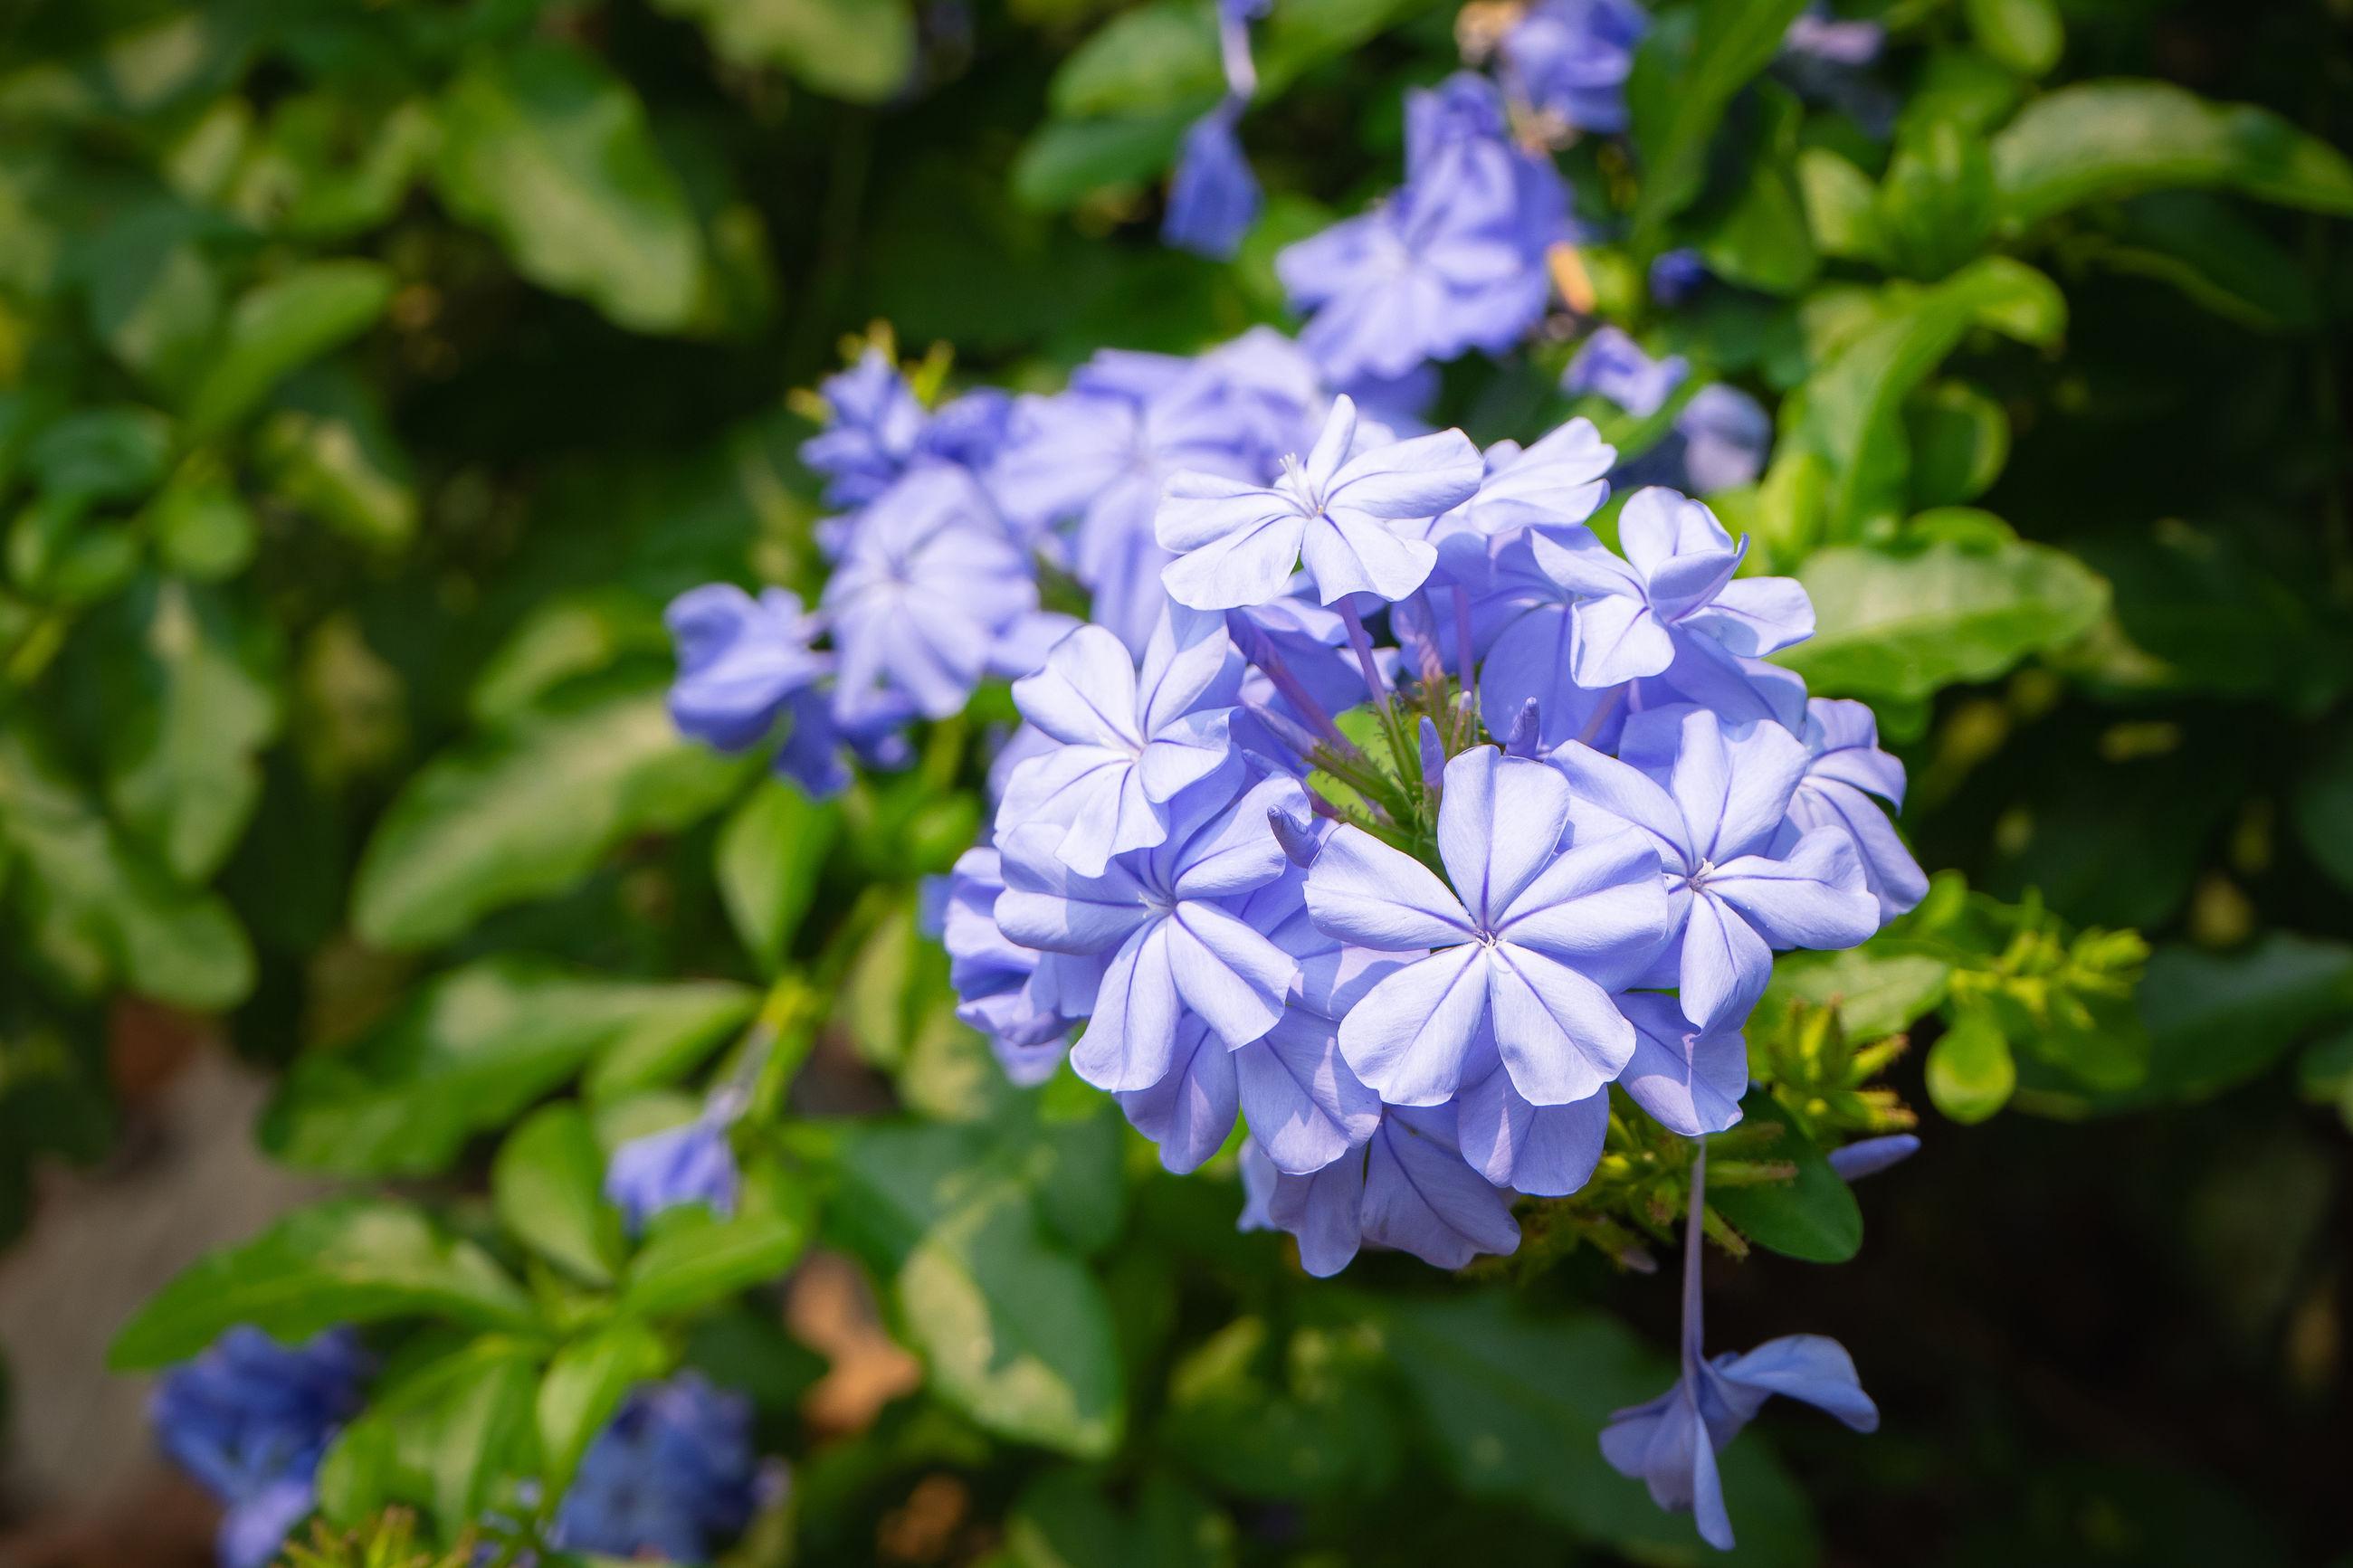 CLOSE-UP OF PURPLE BLUE FLOWERS